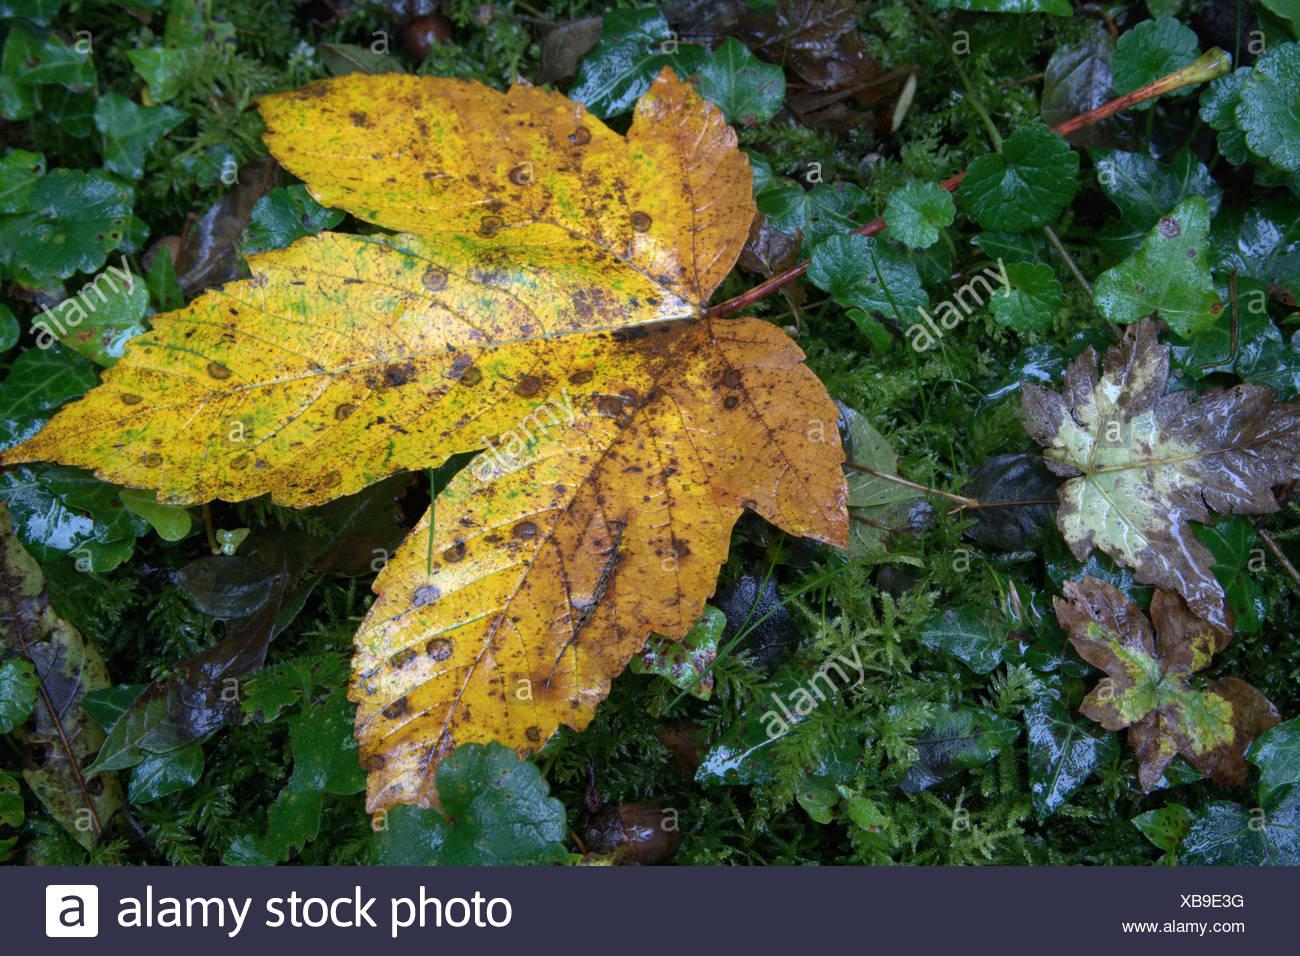 Austria, Vorarlberg, landscapes, Rheinholz, Rhine delta, forest, lowland forest, foliage - Stock Image